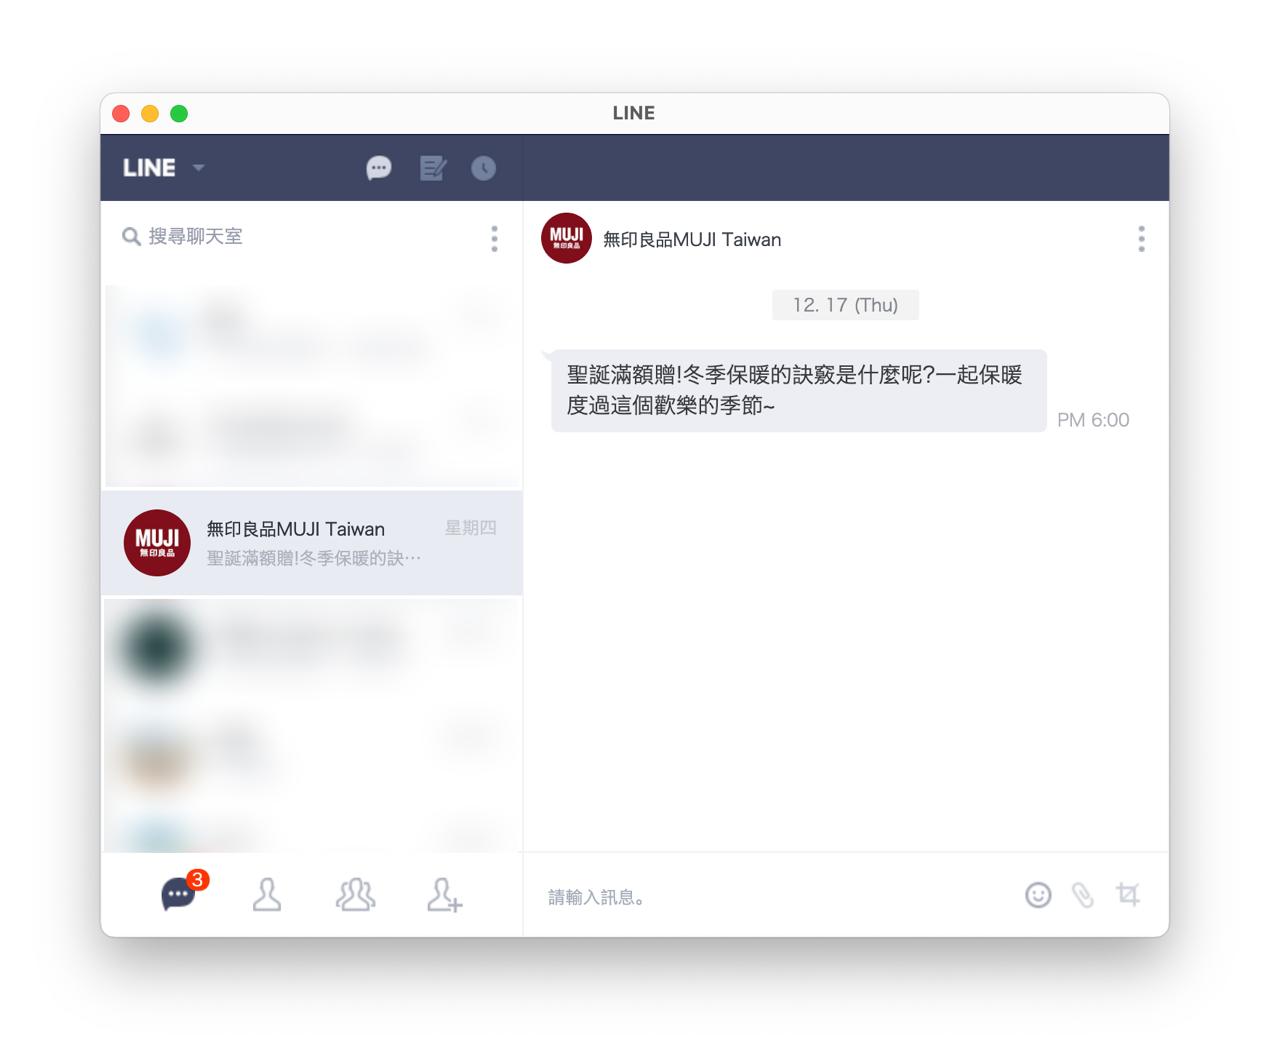 LINE 網頁版無法使用?下載 Chrome 擴充功能在瀏覽器聊天